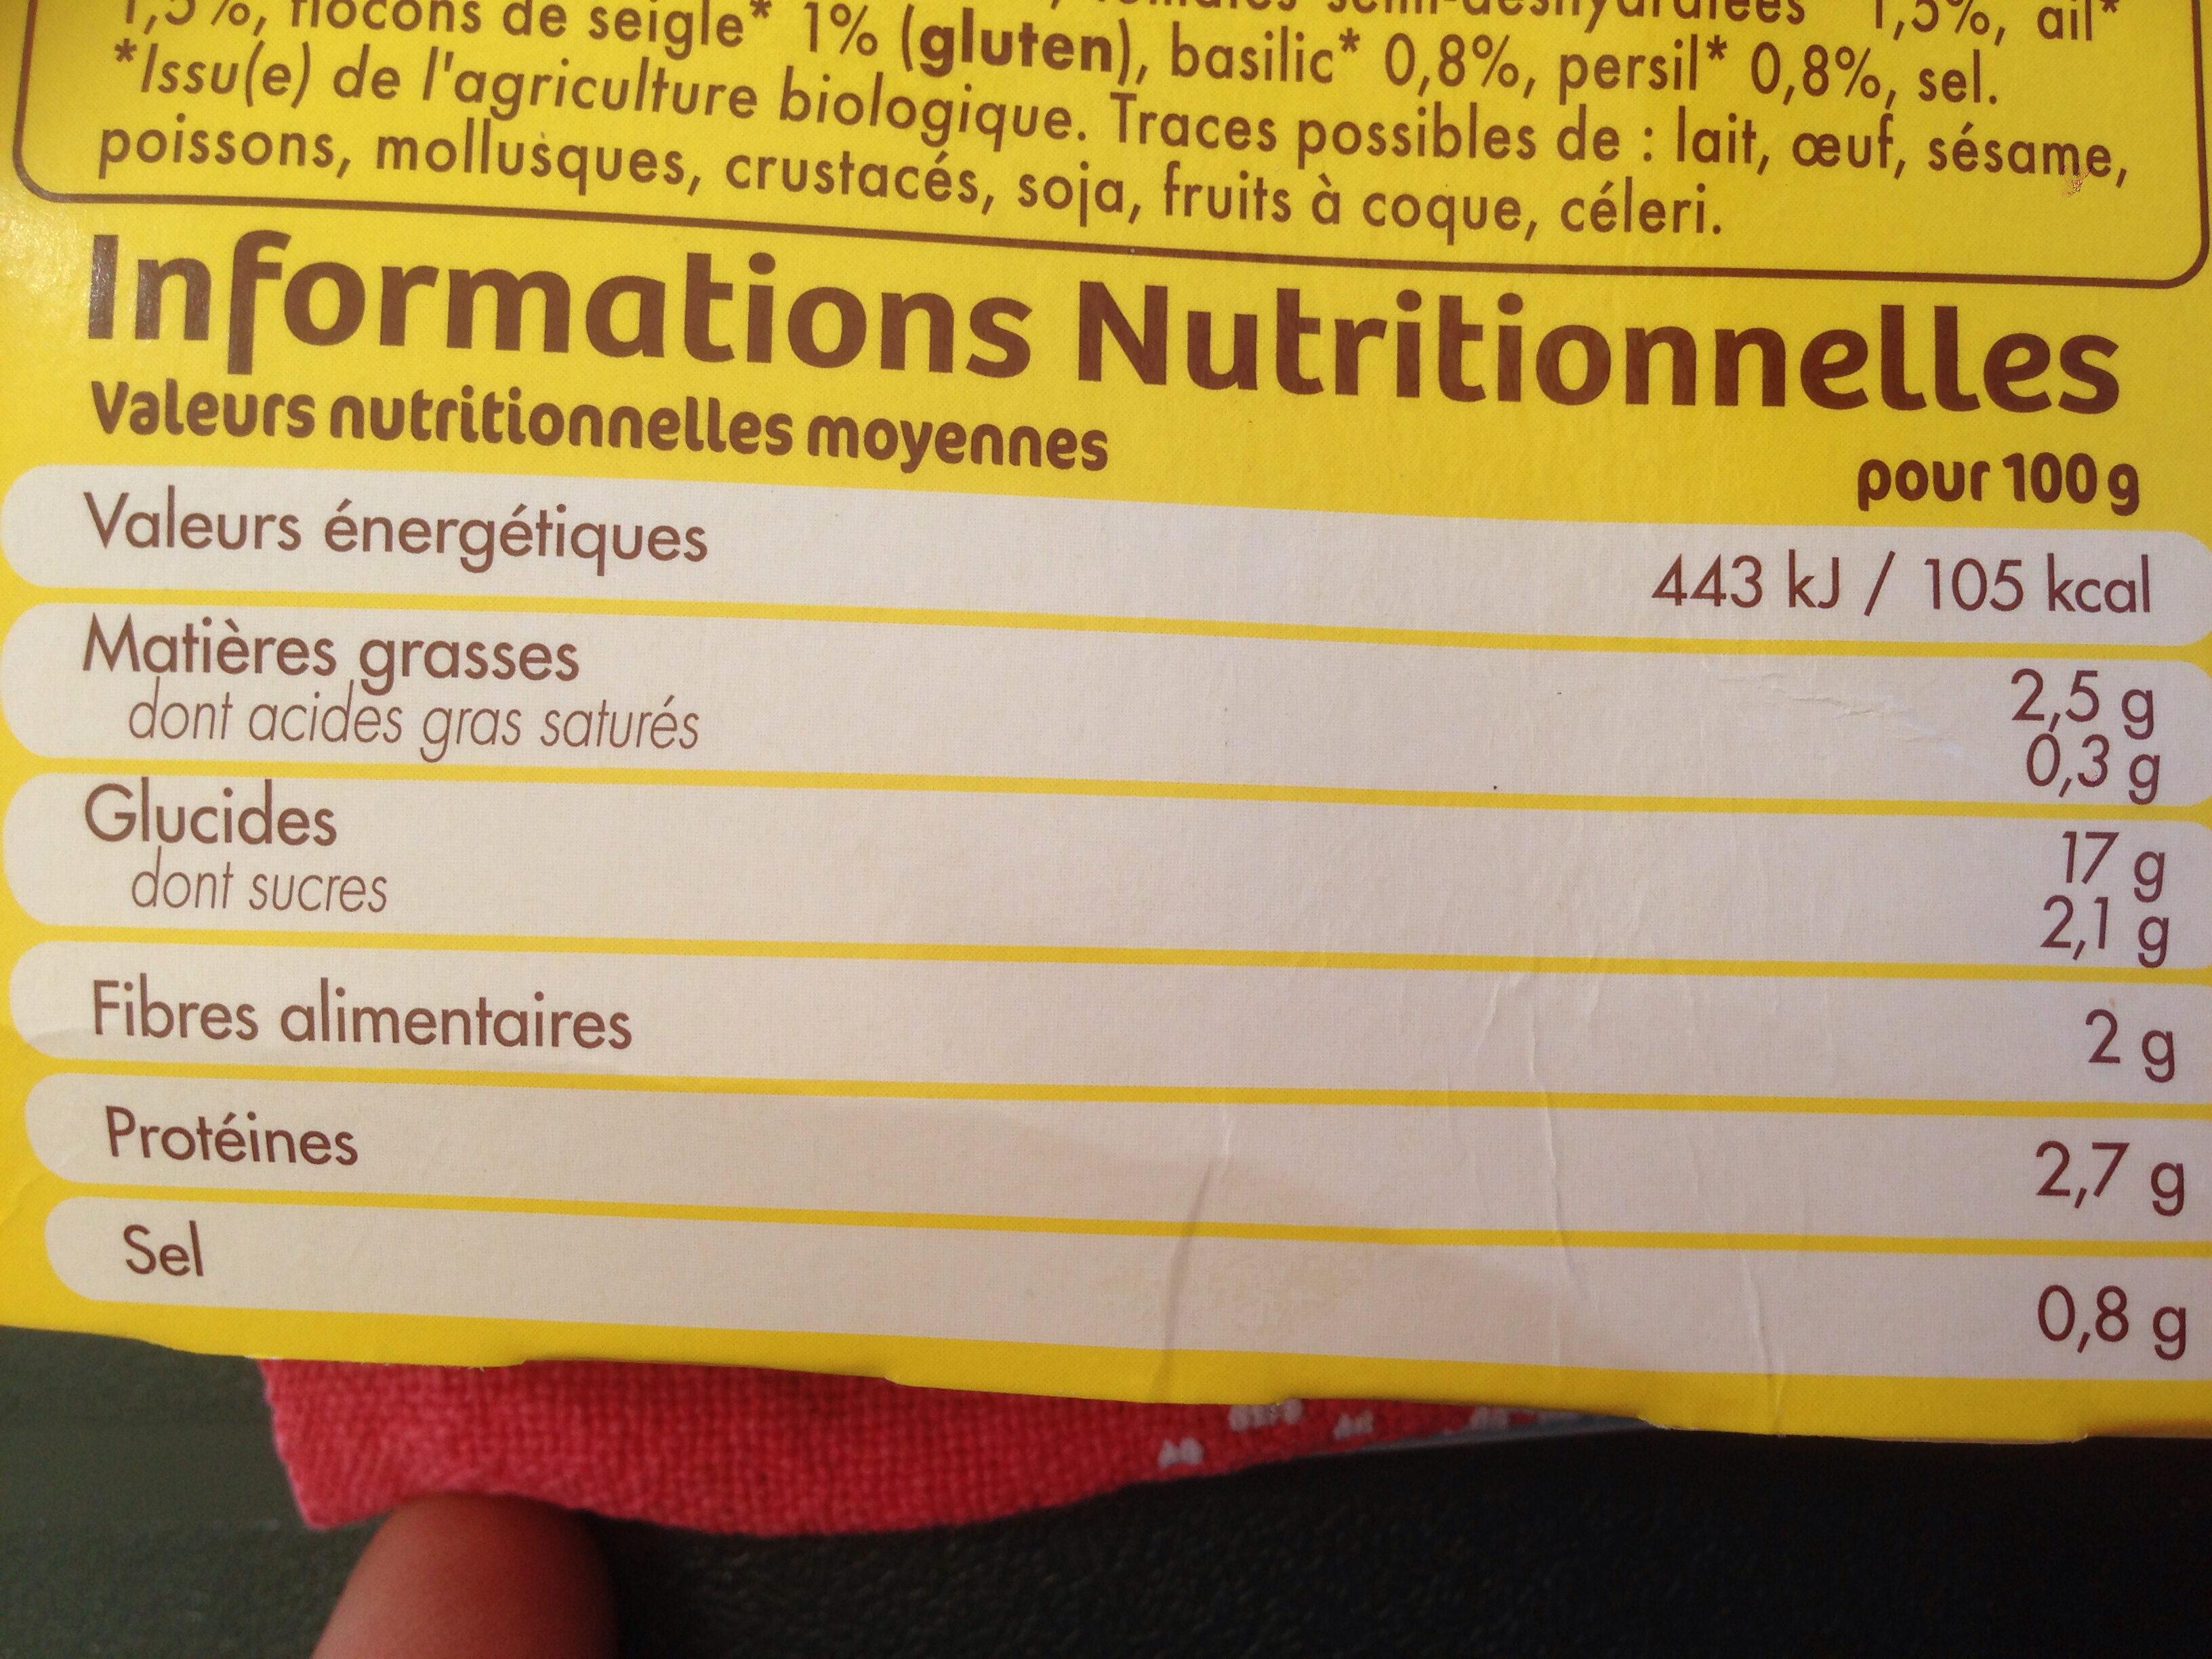 Tipiak 2 grandes galettes legime du soleil cereales - Informations nutritionnelles - fr